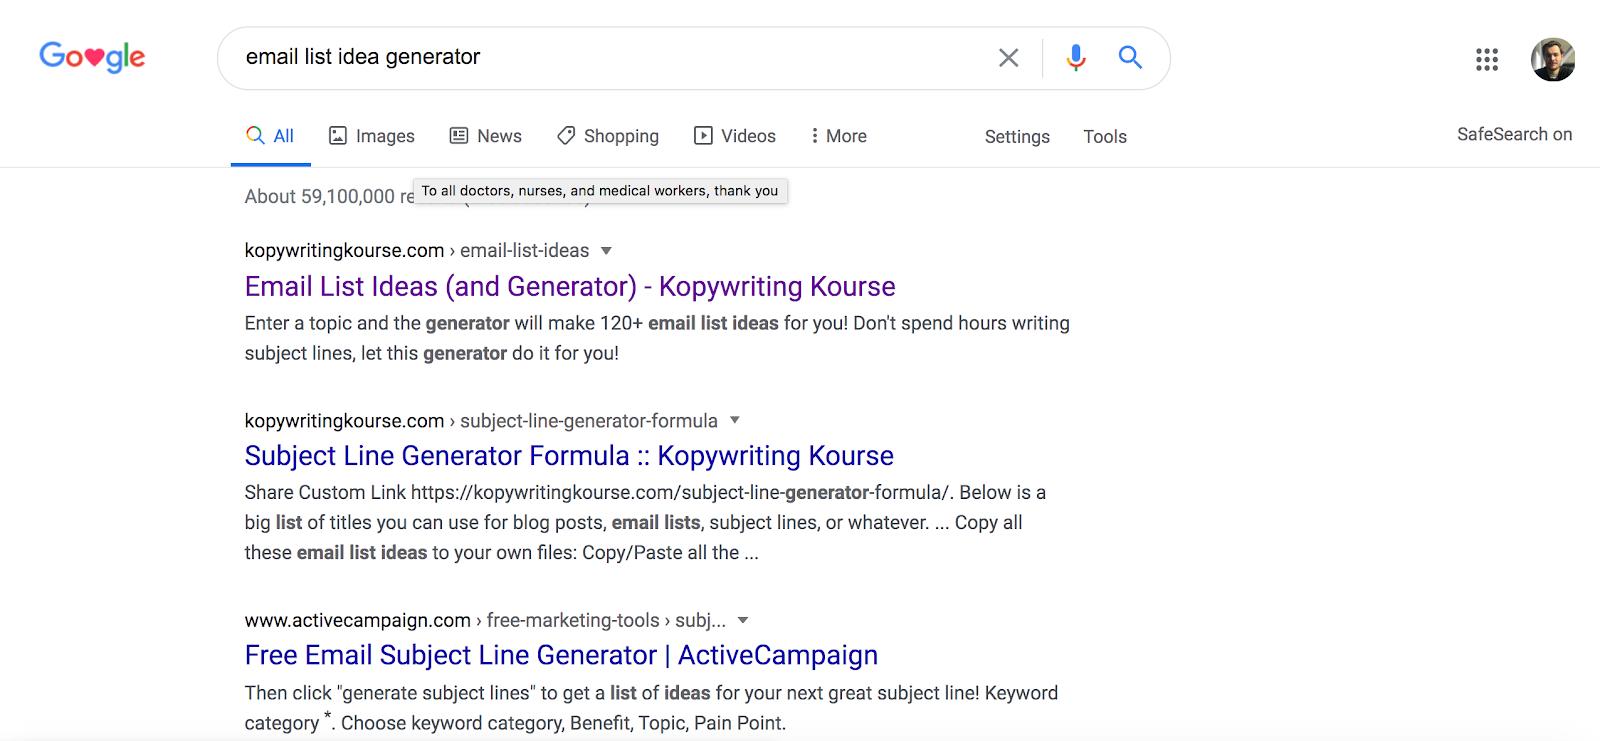 Google search email list idea genarator